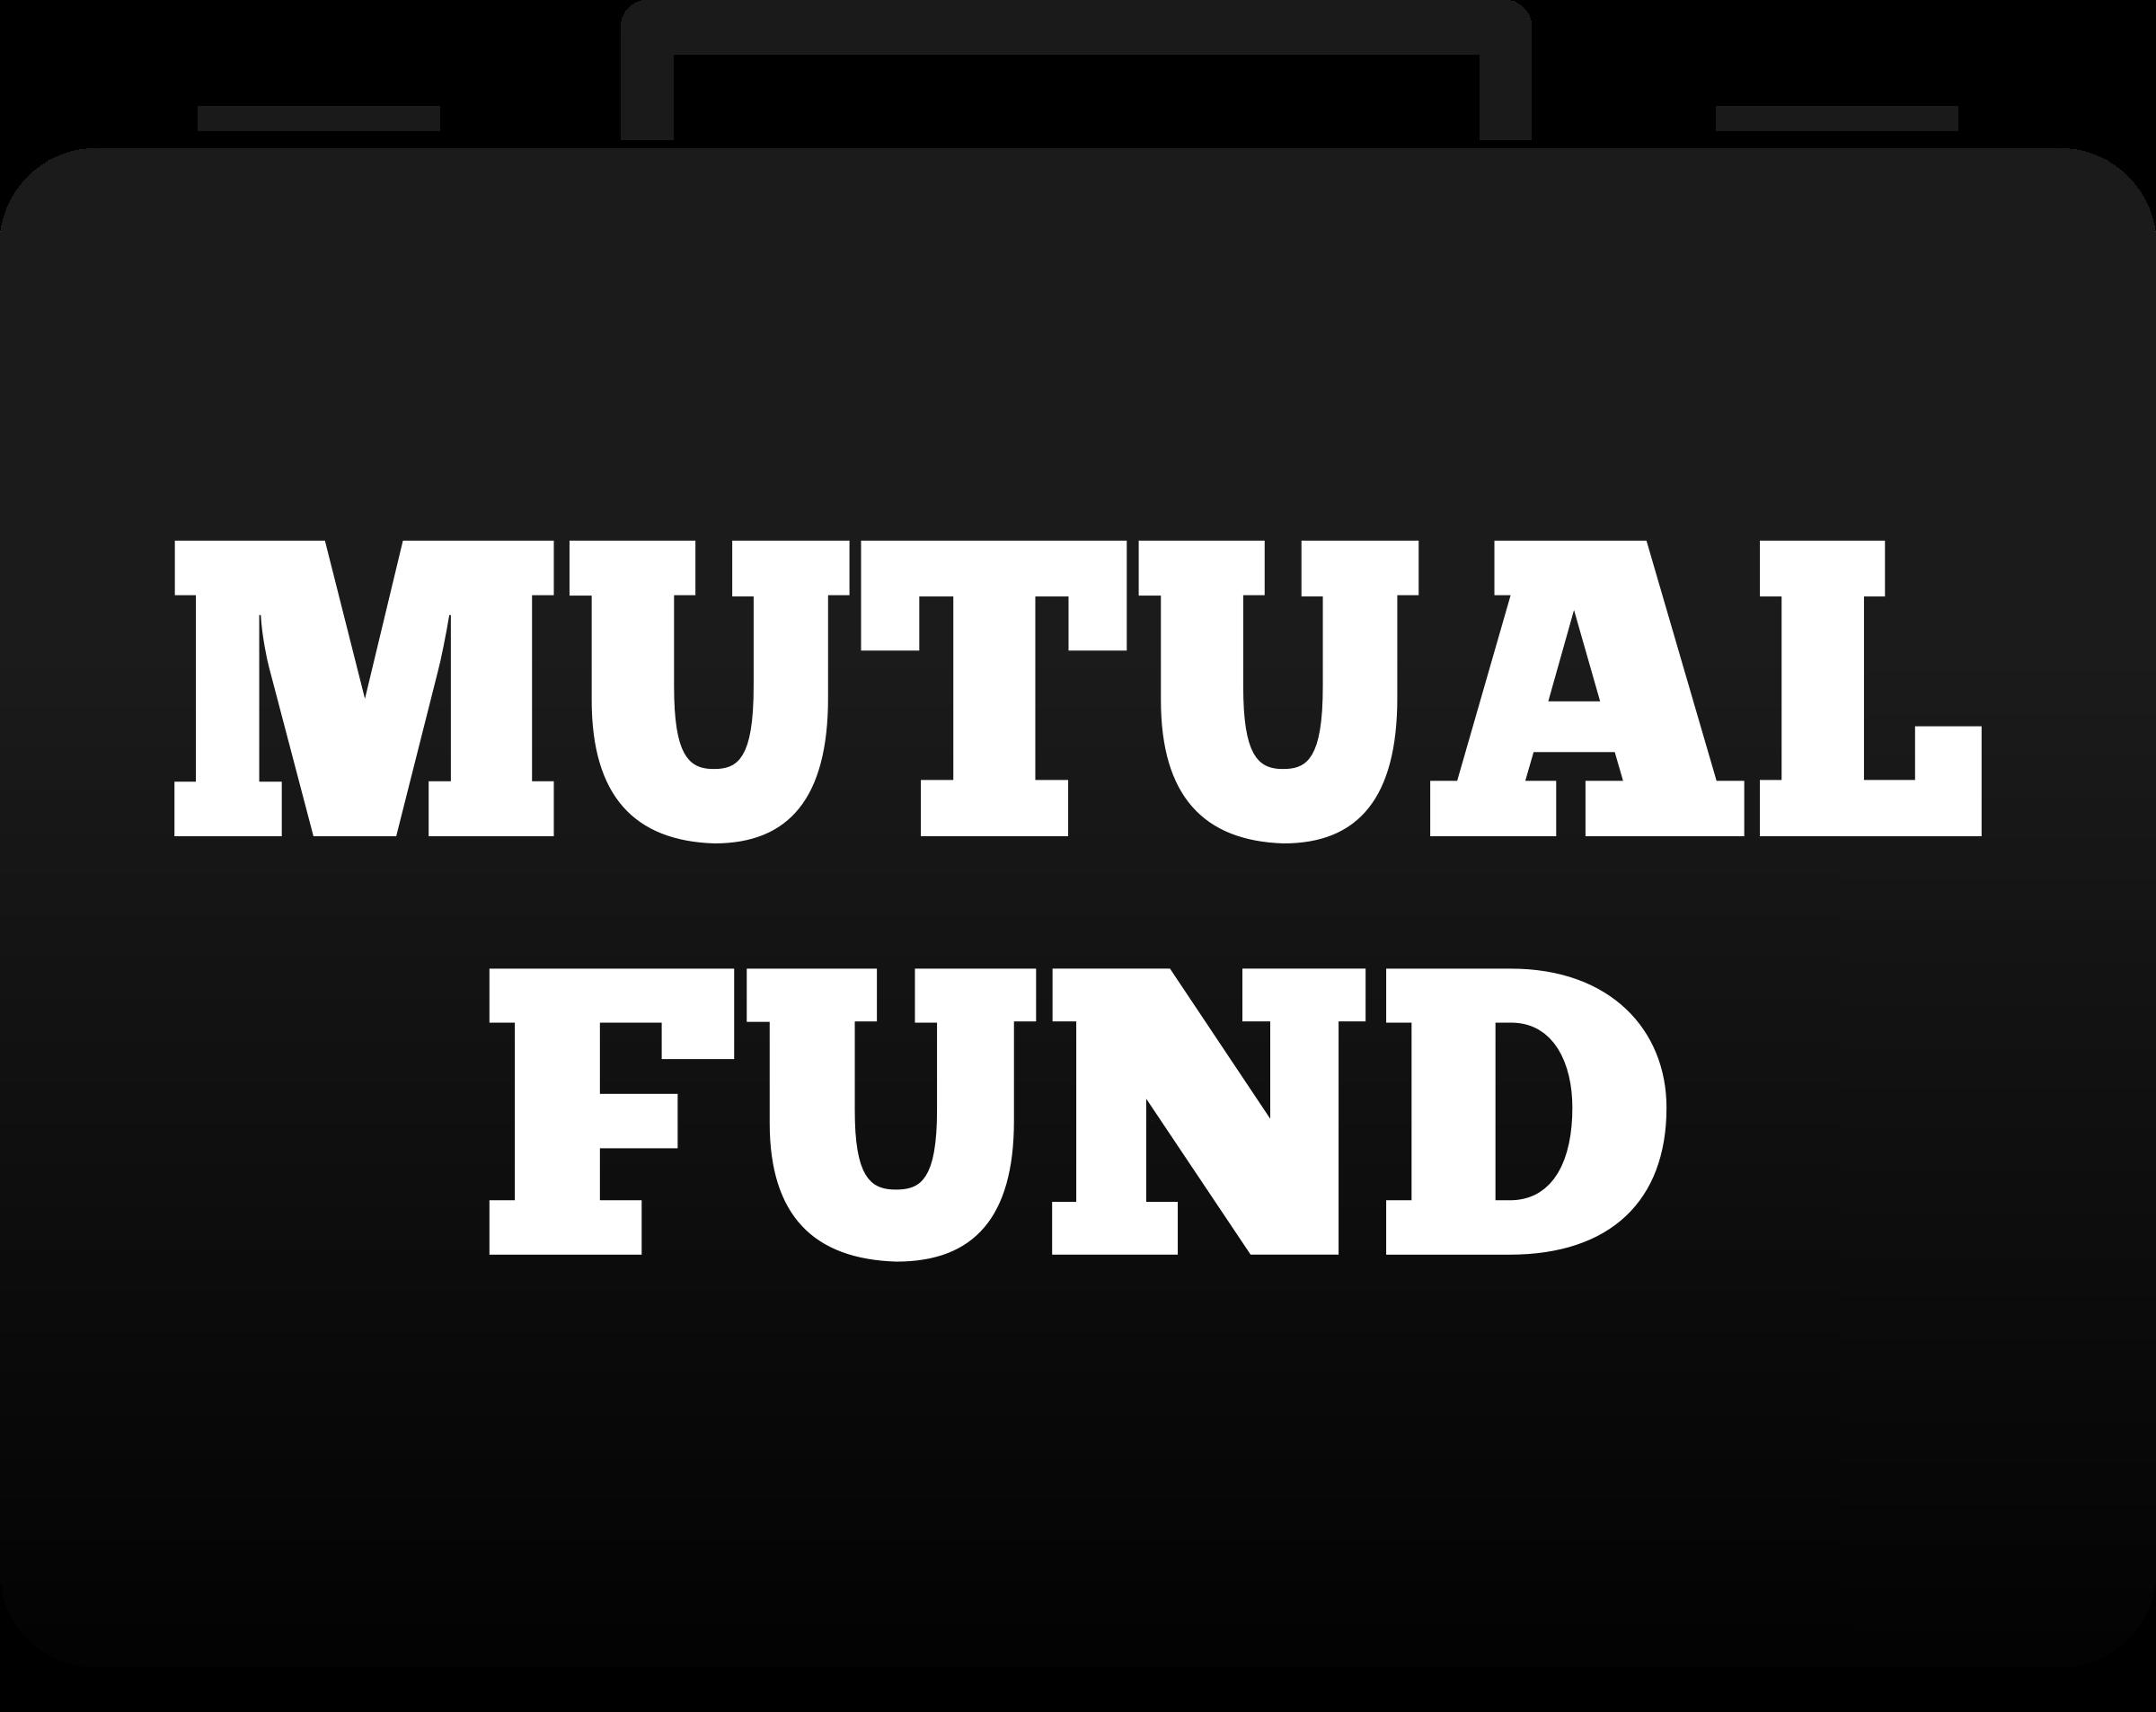 Money Market Mutual Fund Clip Art.